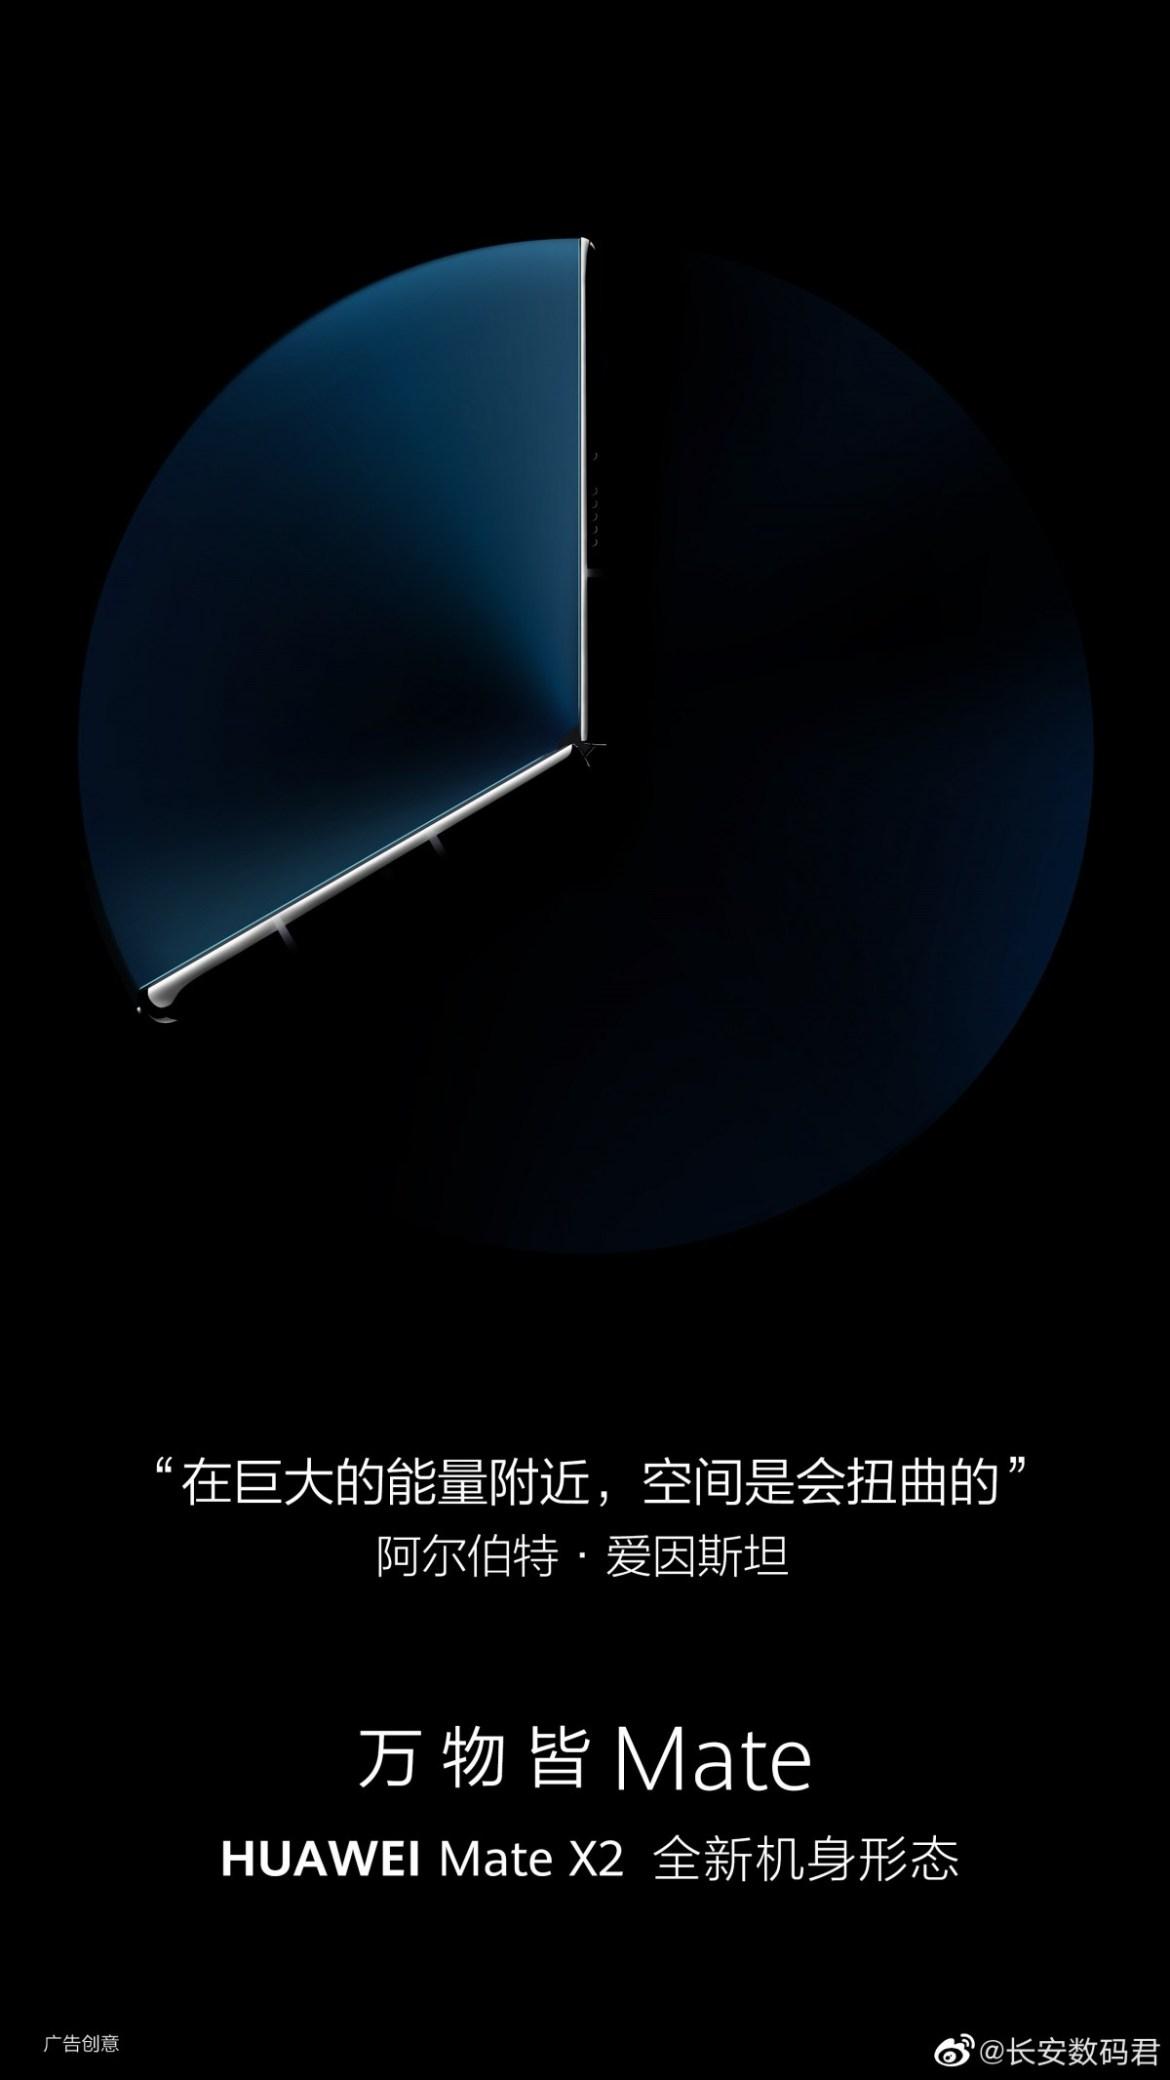 New Huawei Mate X2 image confirms inward fold